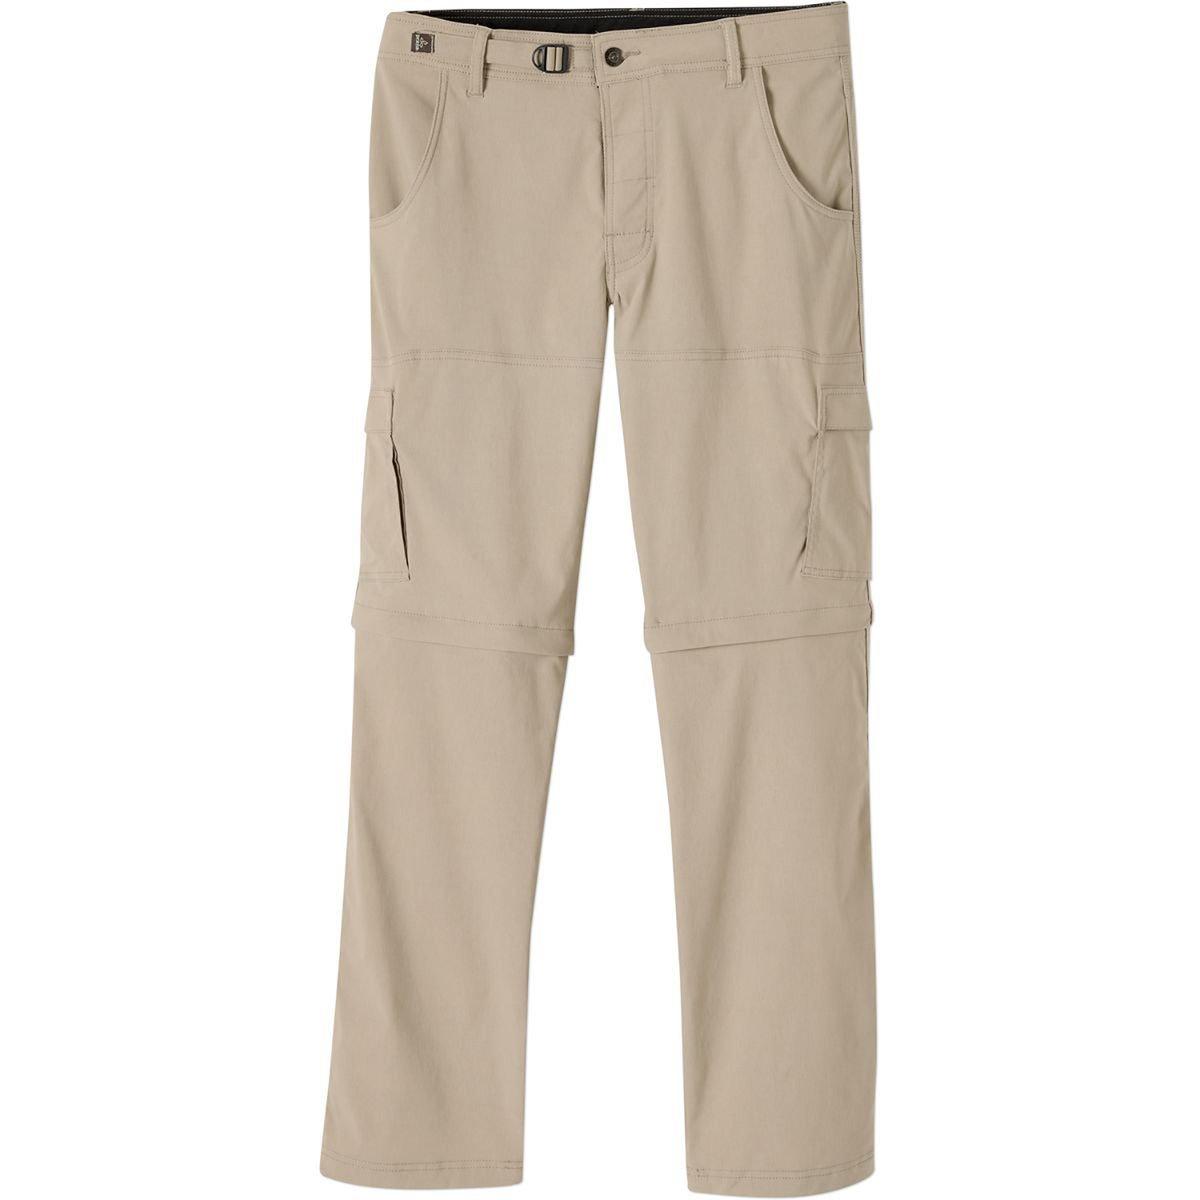 prAna Men's Stretch Zion Convertible 30'' Pants, Dark Khaki, 28W 30L